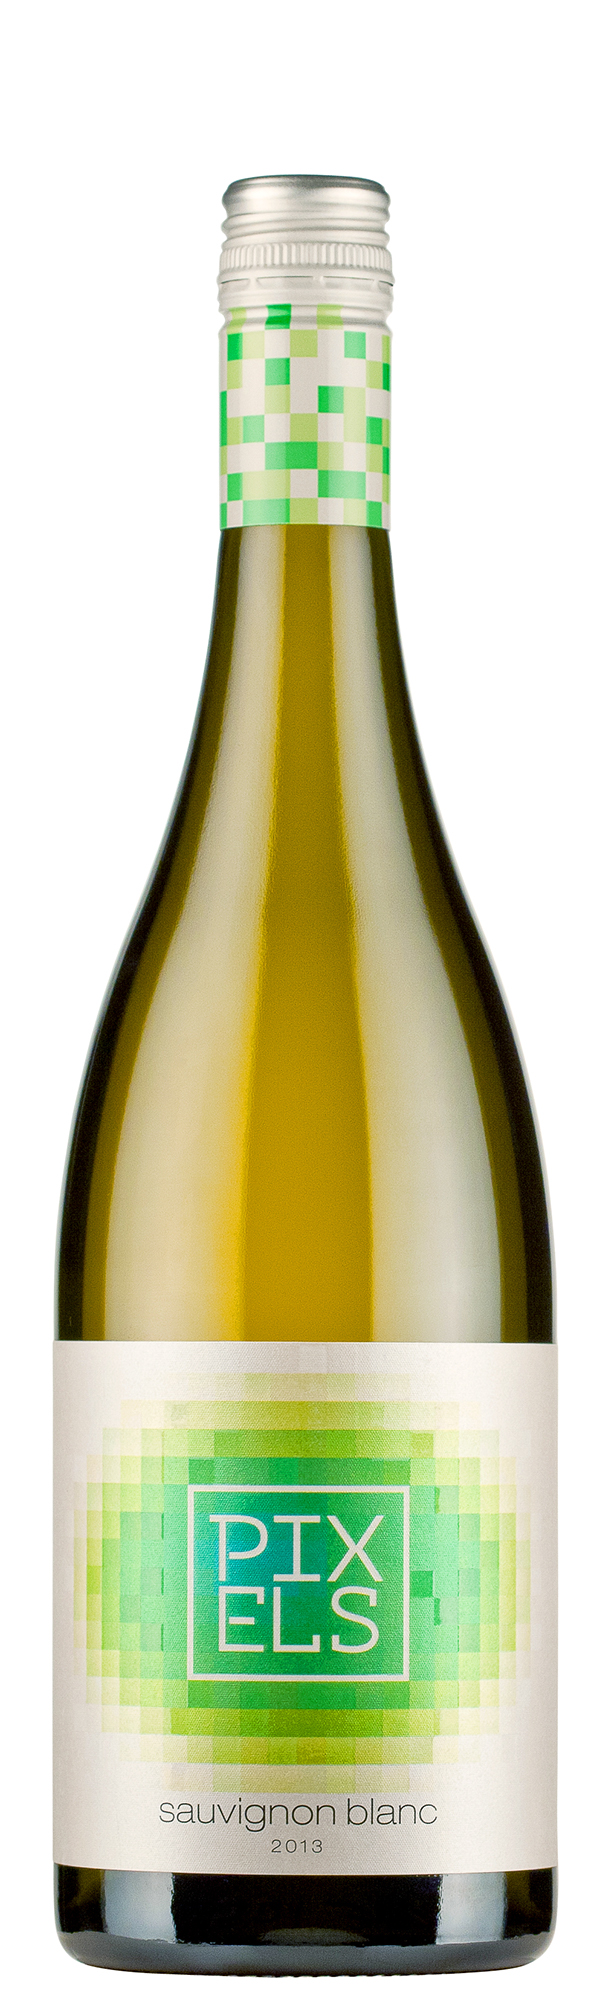 pixels wine label best labels amazing labels awesome label best wine amazing wine contemporary label modern label beautiful label Jordan Jelev labelmaker fresh new outstanding